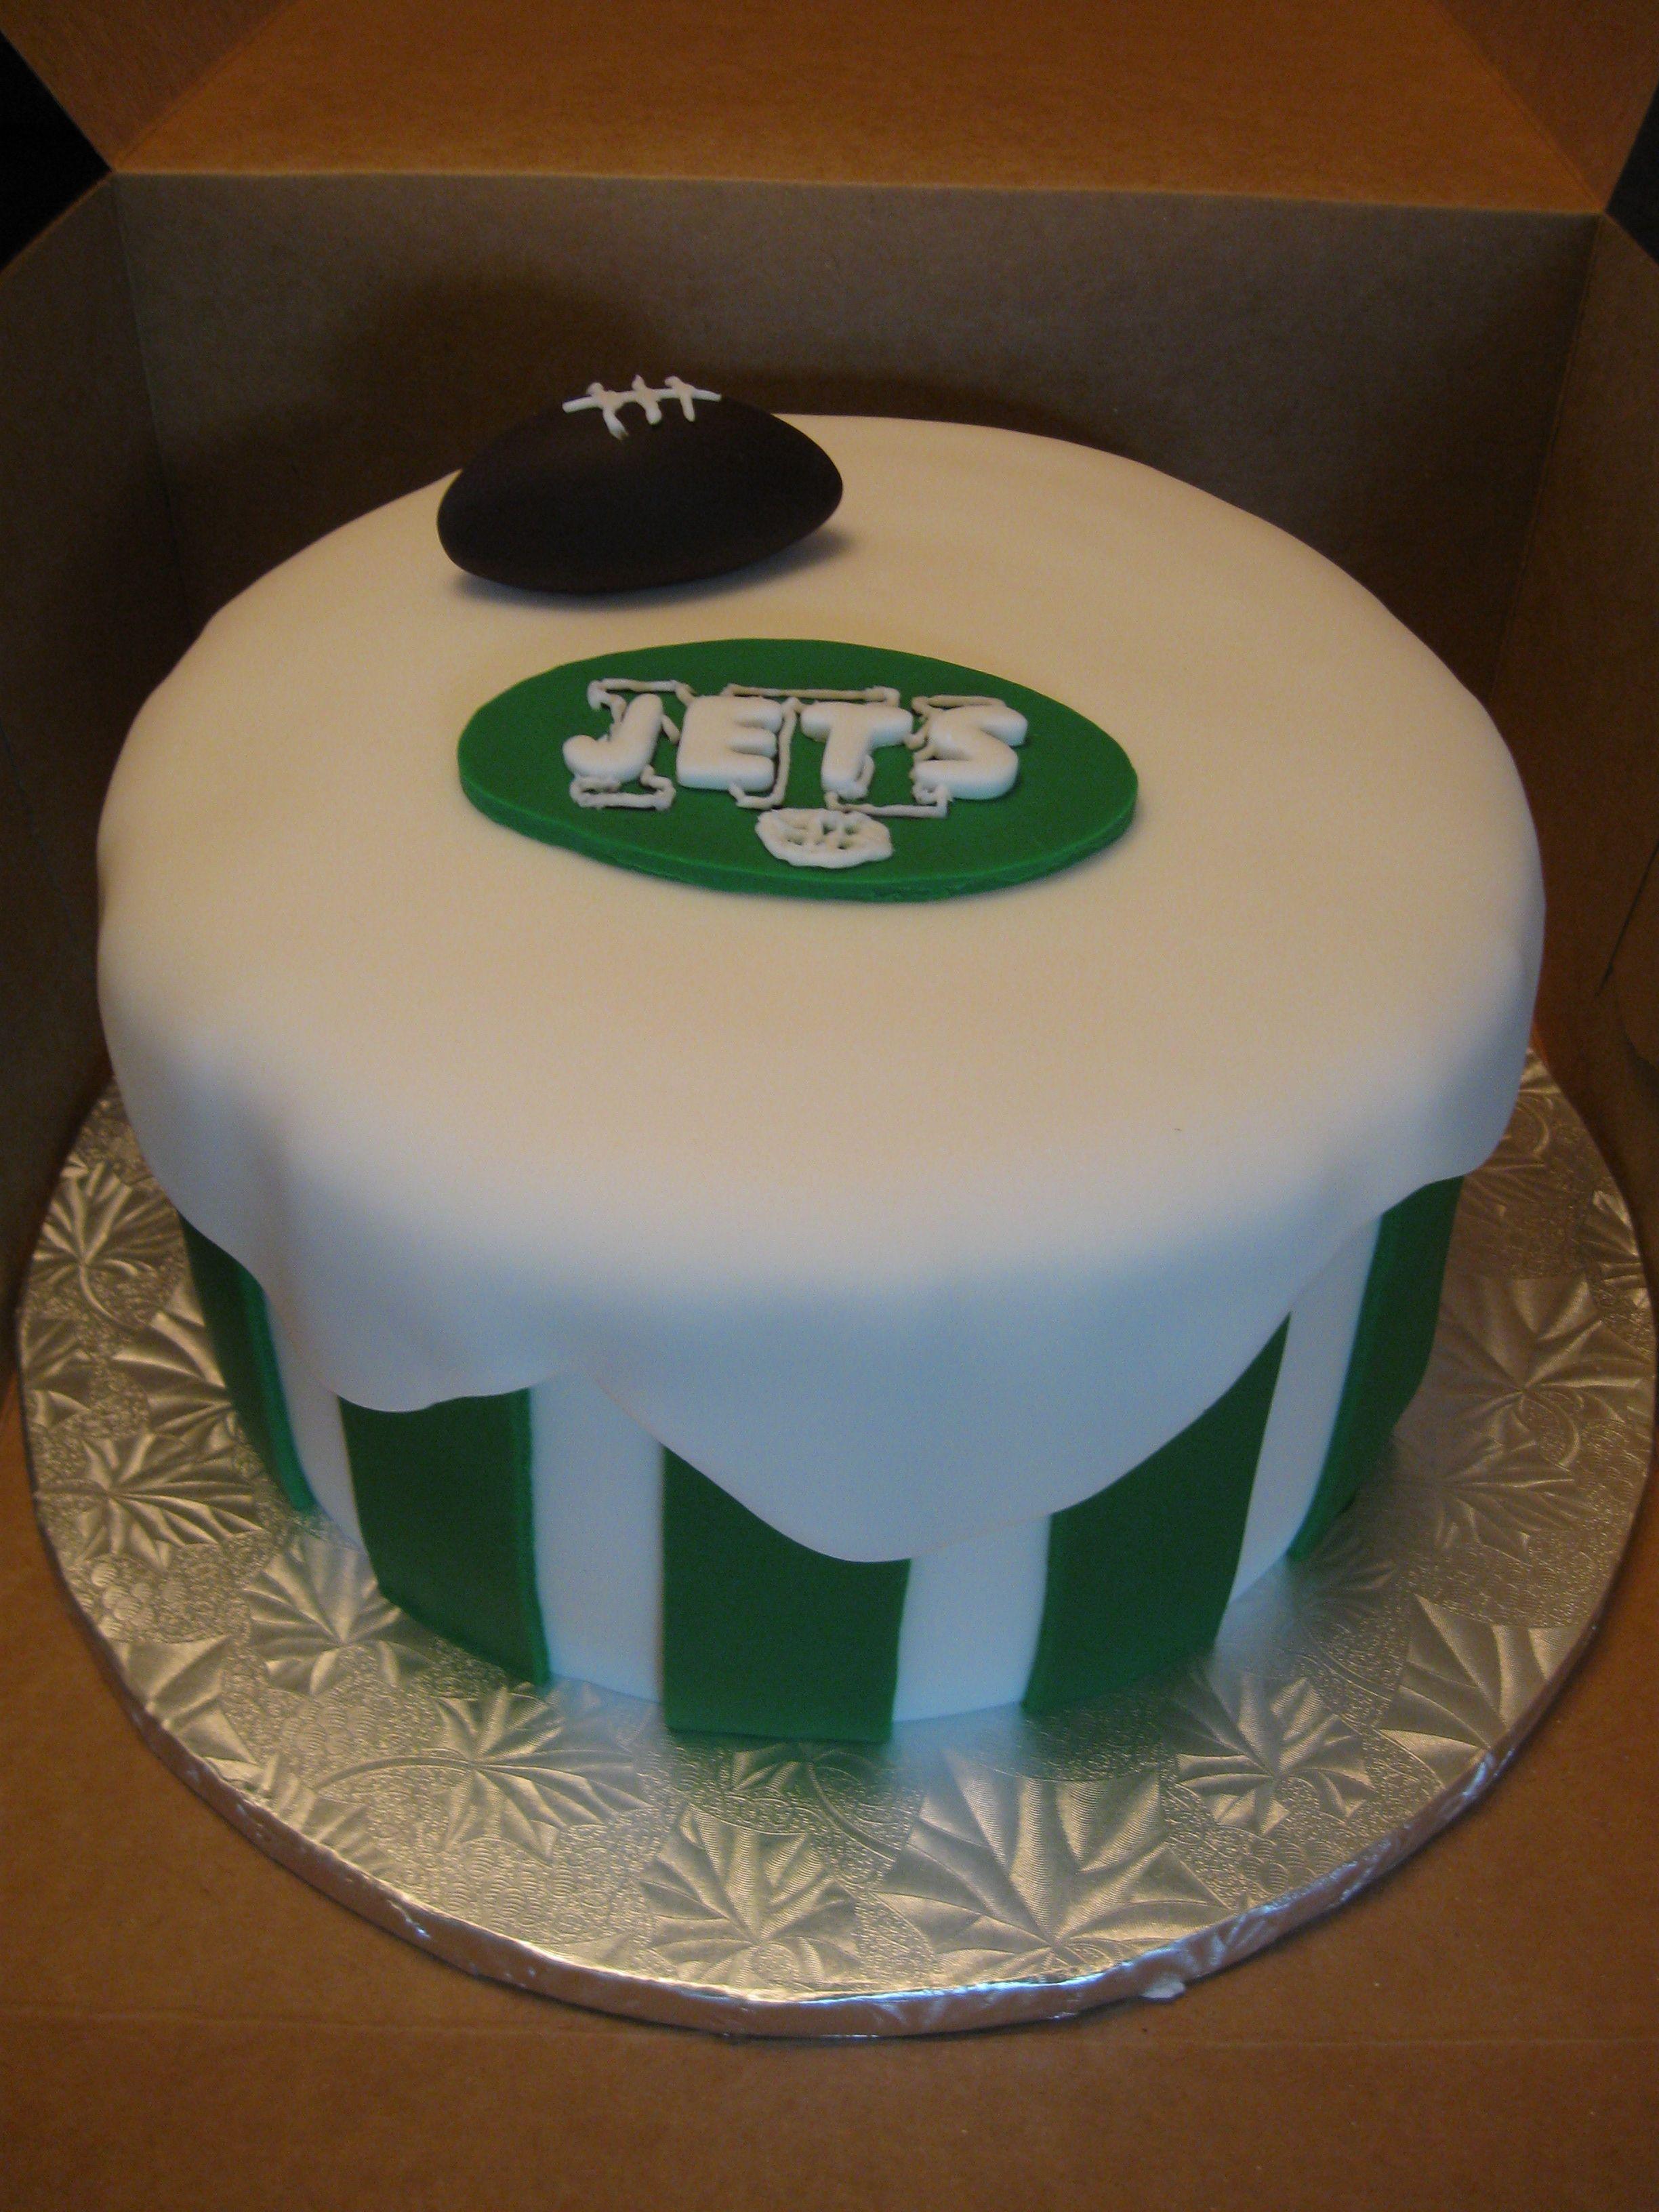 Incredible Nfl Jets Cake Cake No Bake Cake Funny Birthday Cards Online Amentibdeldamsfinfo